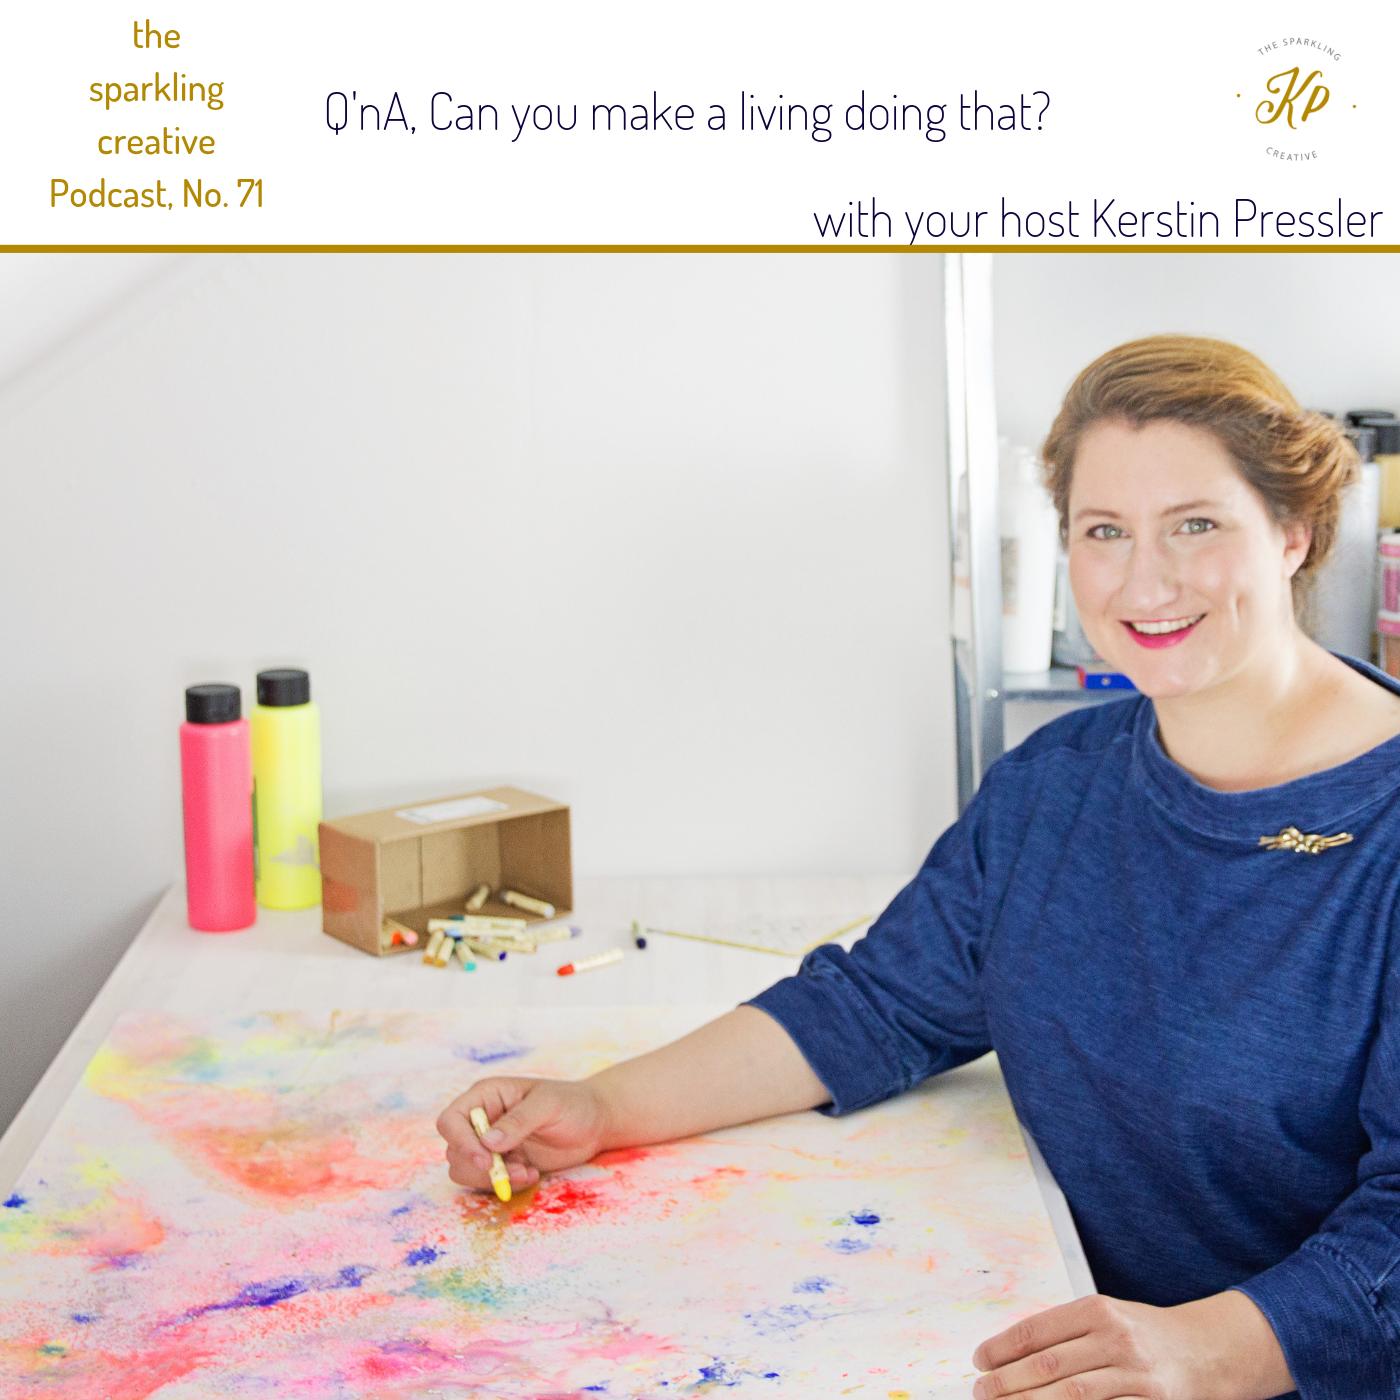 the sparkling creative Podcast,  Episode 71: Q'nA, Can you make a living doing that?, www.kerstinpressler.com/blog-2/episode71